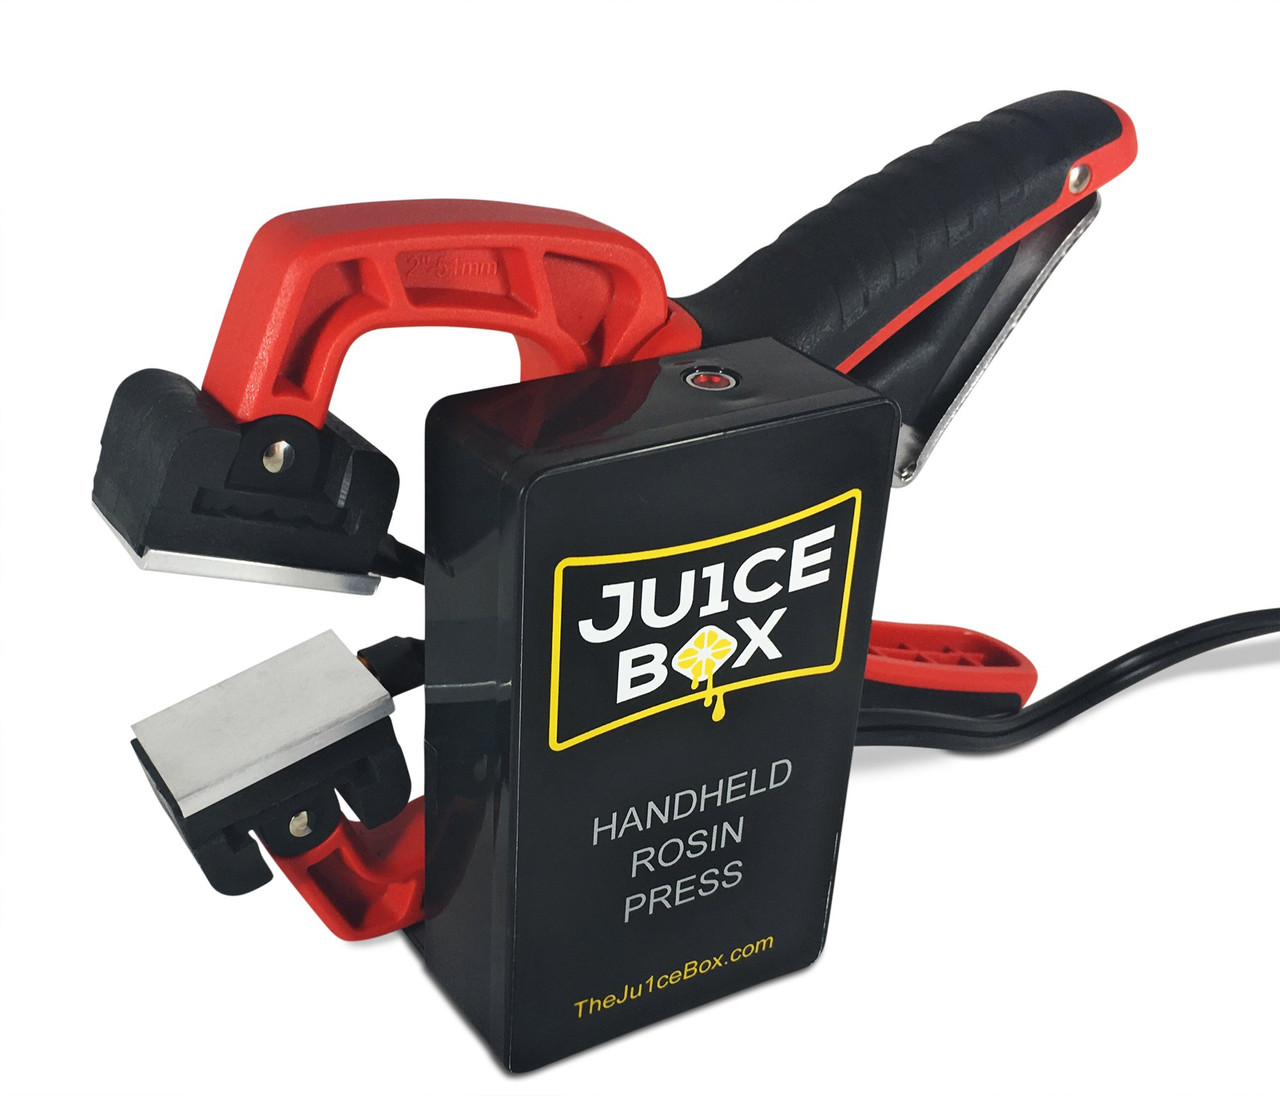 Ju1ce Box - Rosin Press (Free Shipping)